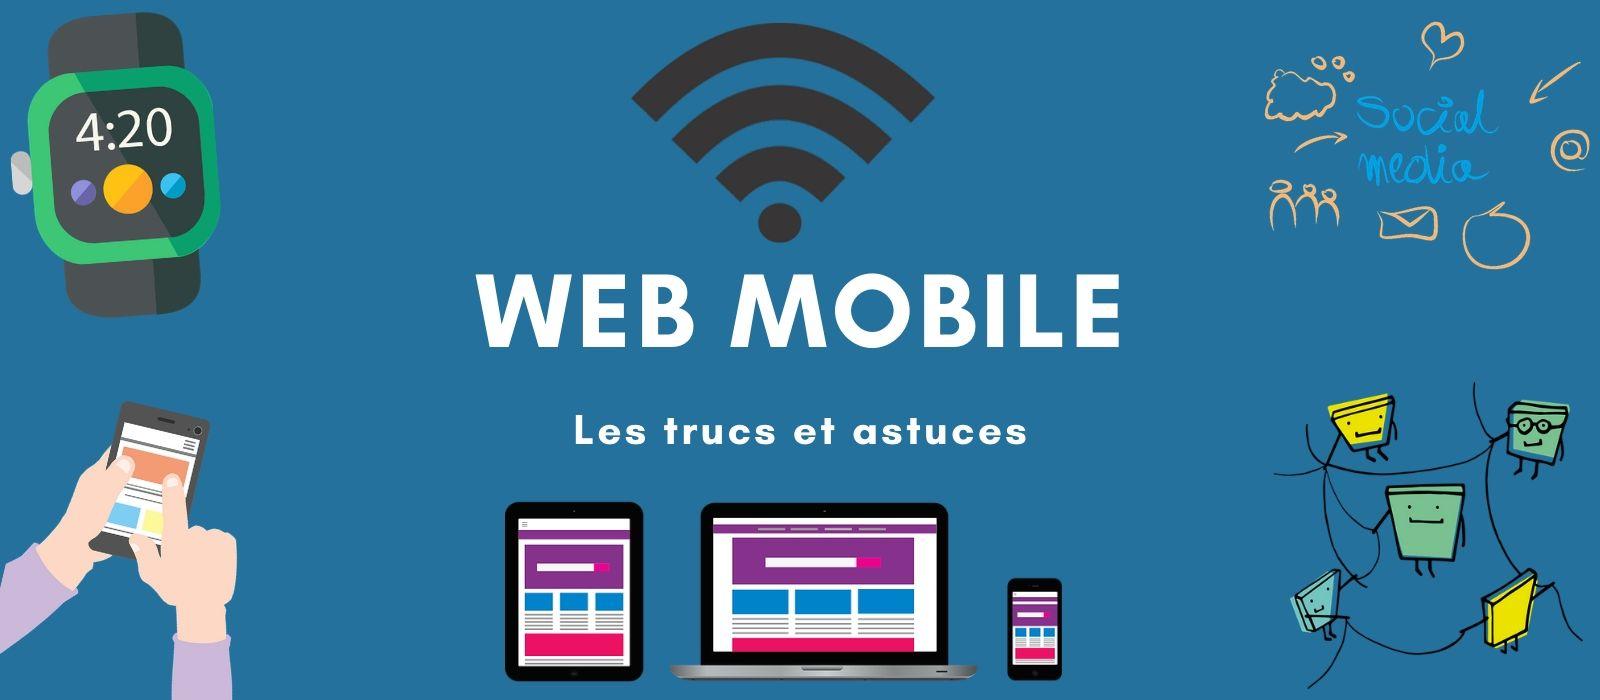 Astuce web et mobile